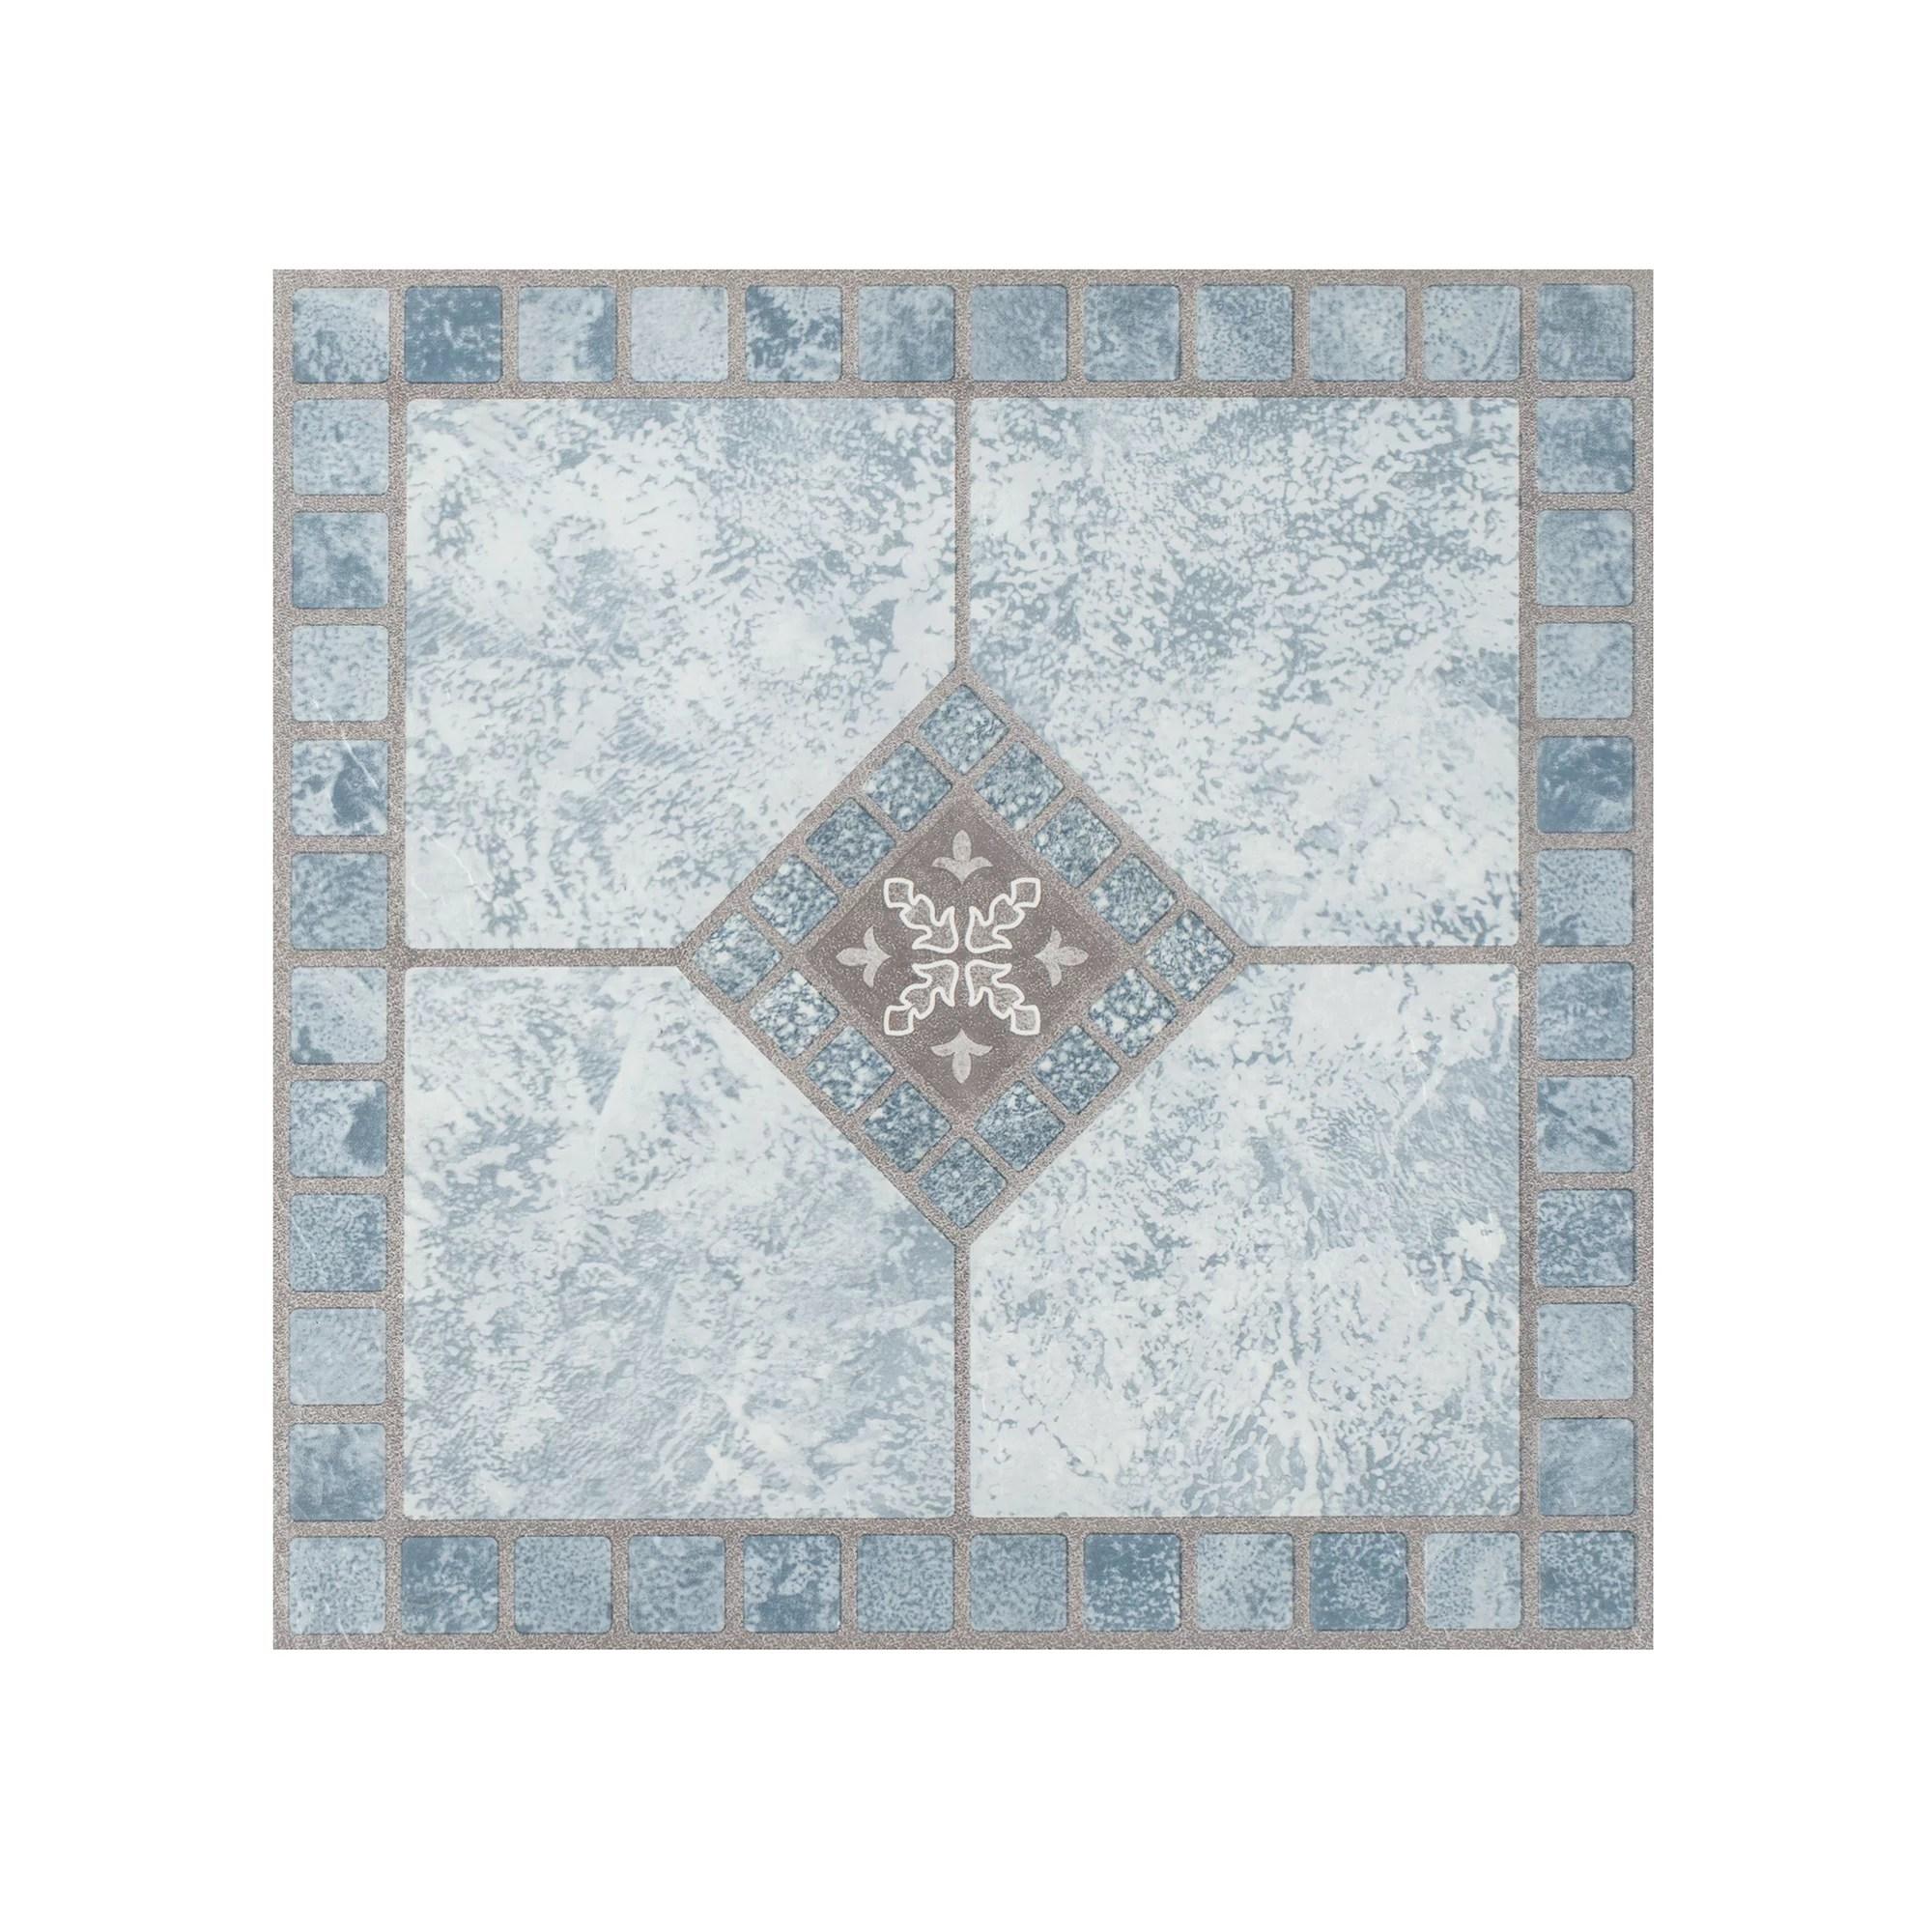 achim portfolio 12 x12 2 0mm peel stick vinyl floor tiles 9 tiles 9 sq ft blue diamond